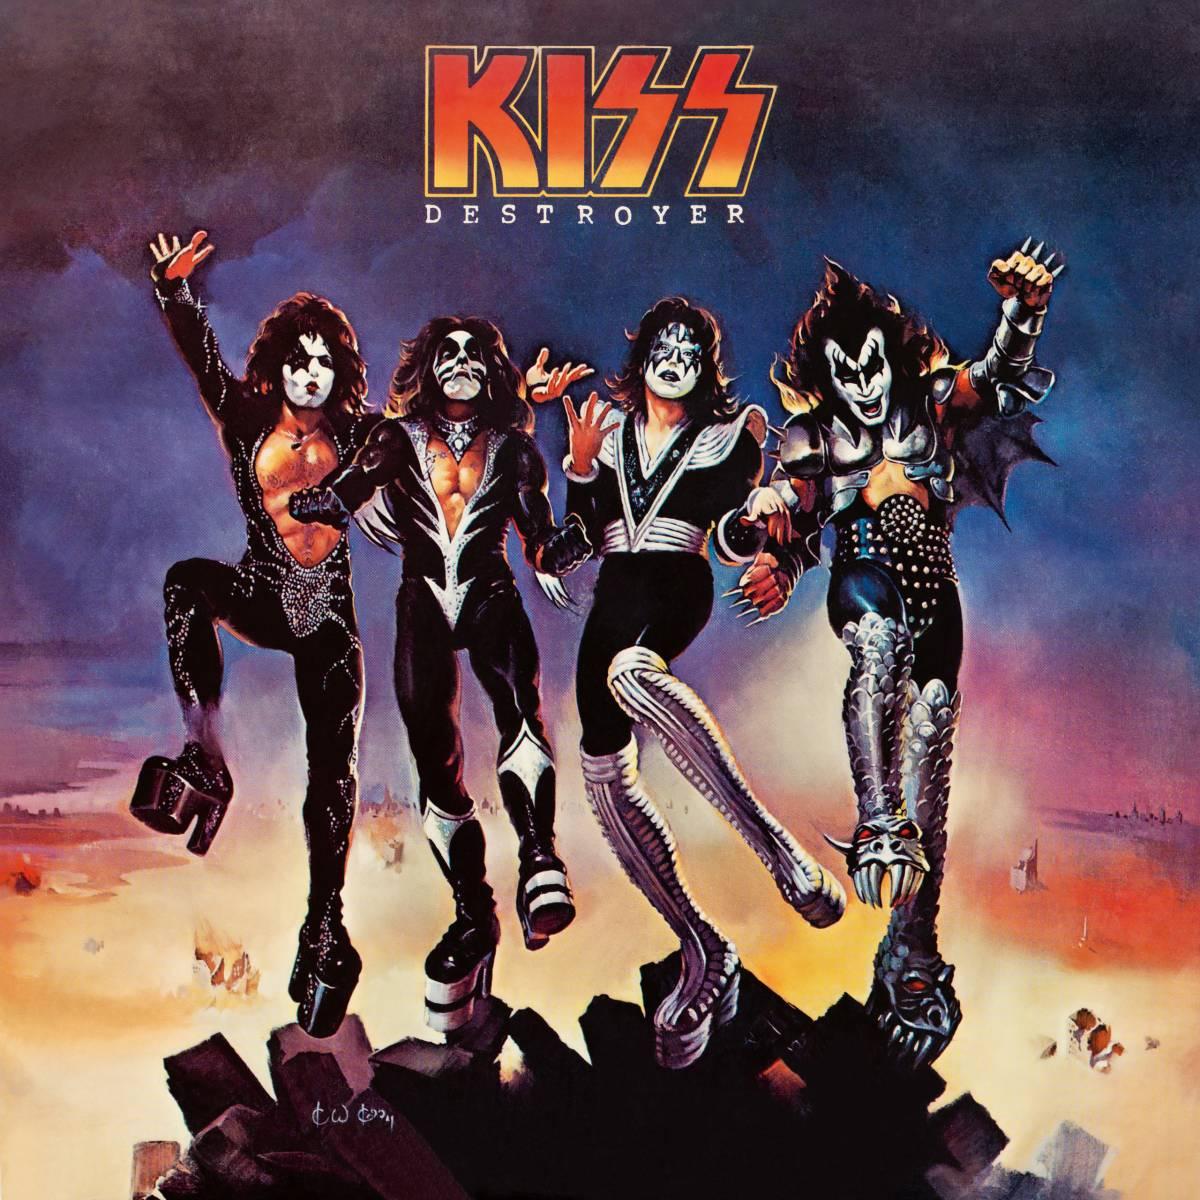 Kiss_Destroyer_front.tif